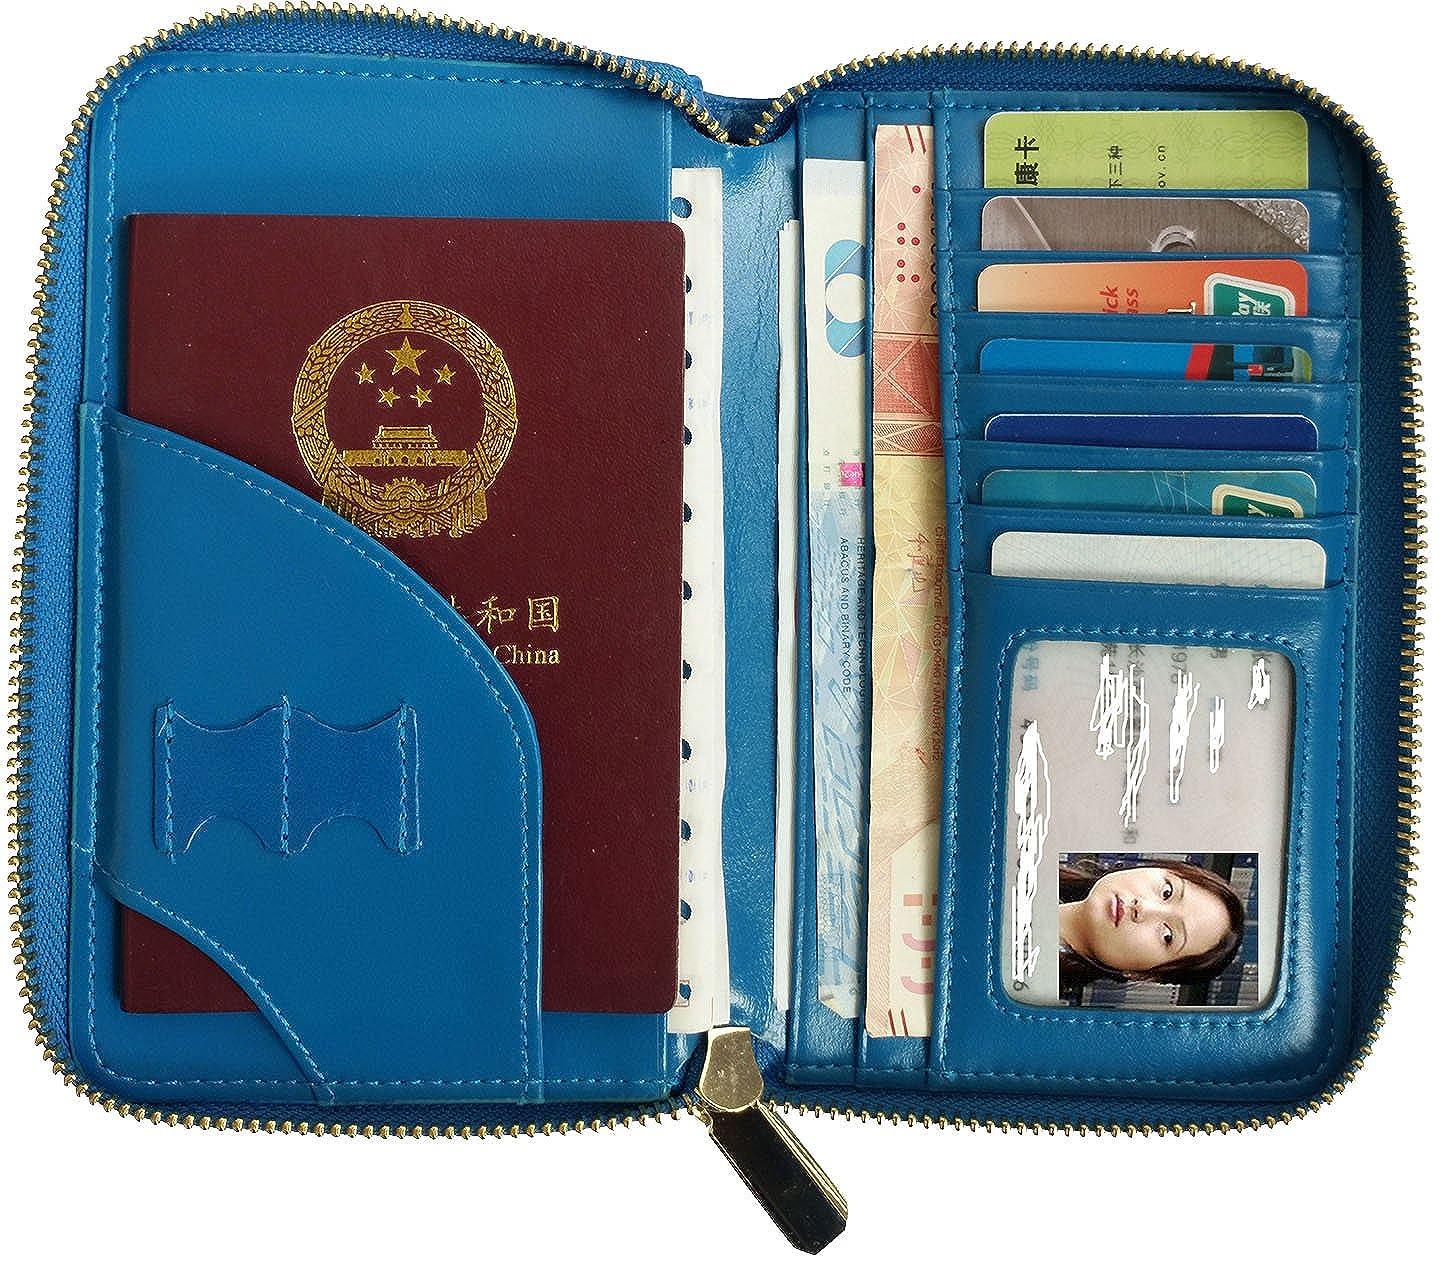 56c769ed8fe Amazon.com  Women RFID Blocking Genuine Leather Passport Cover ...